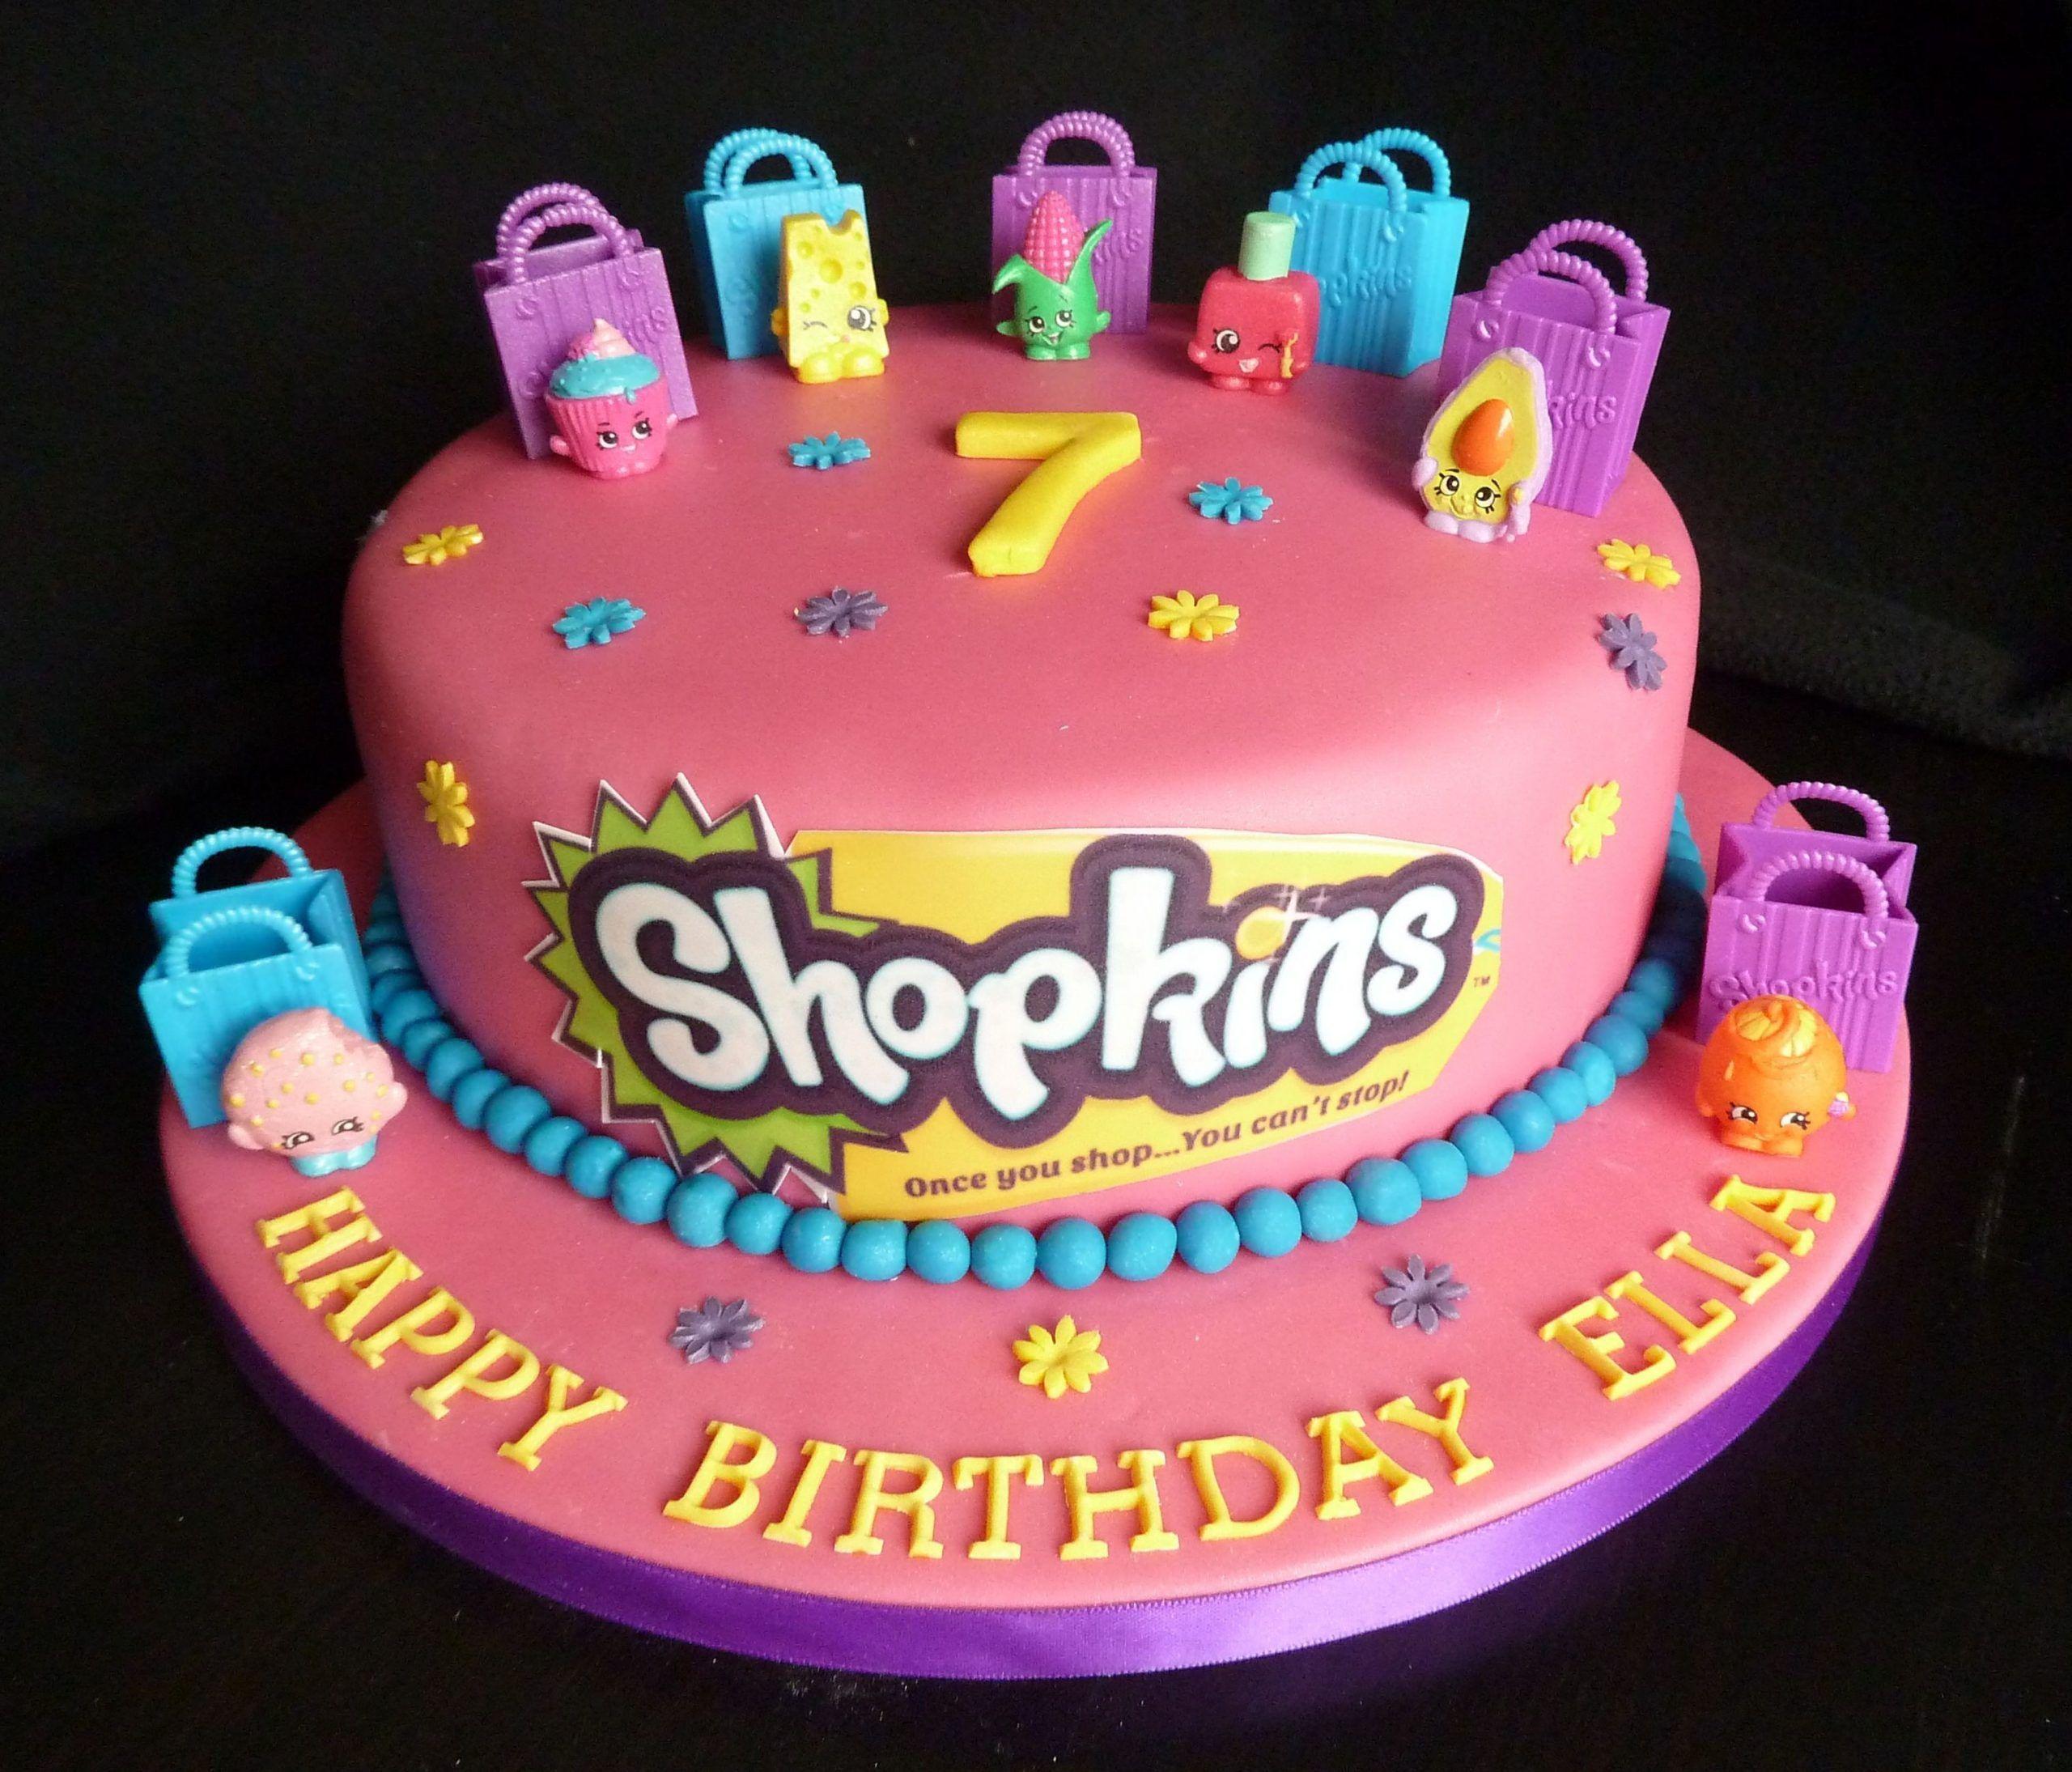 Shopkins Birthday Cake Ideas In 2020